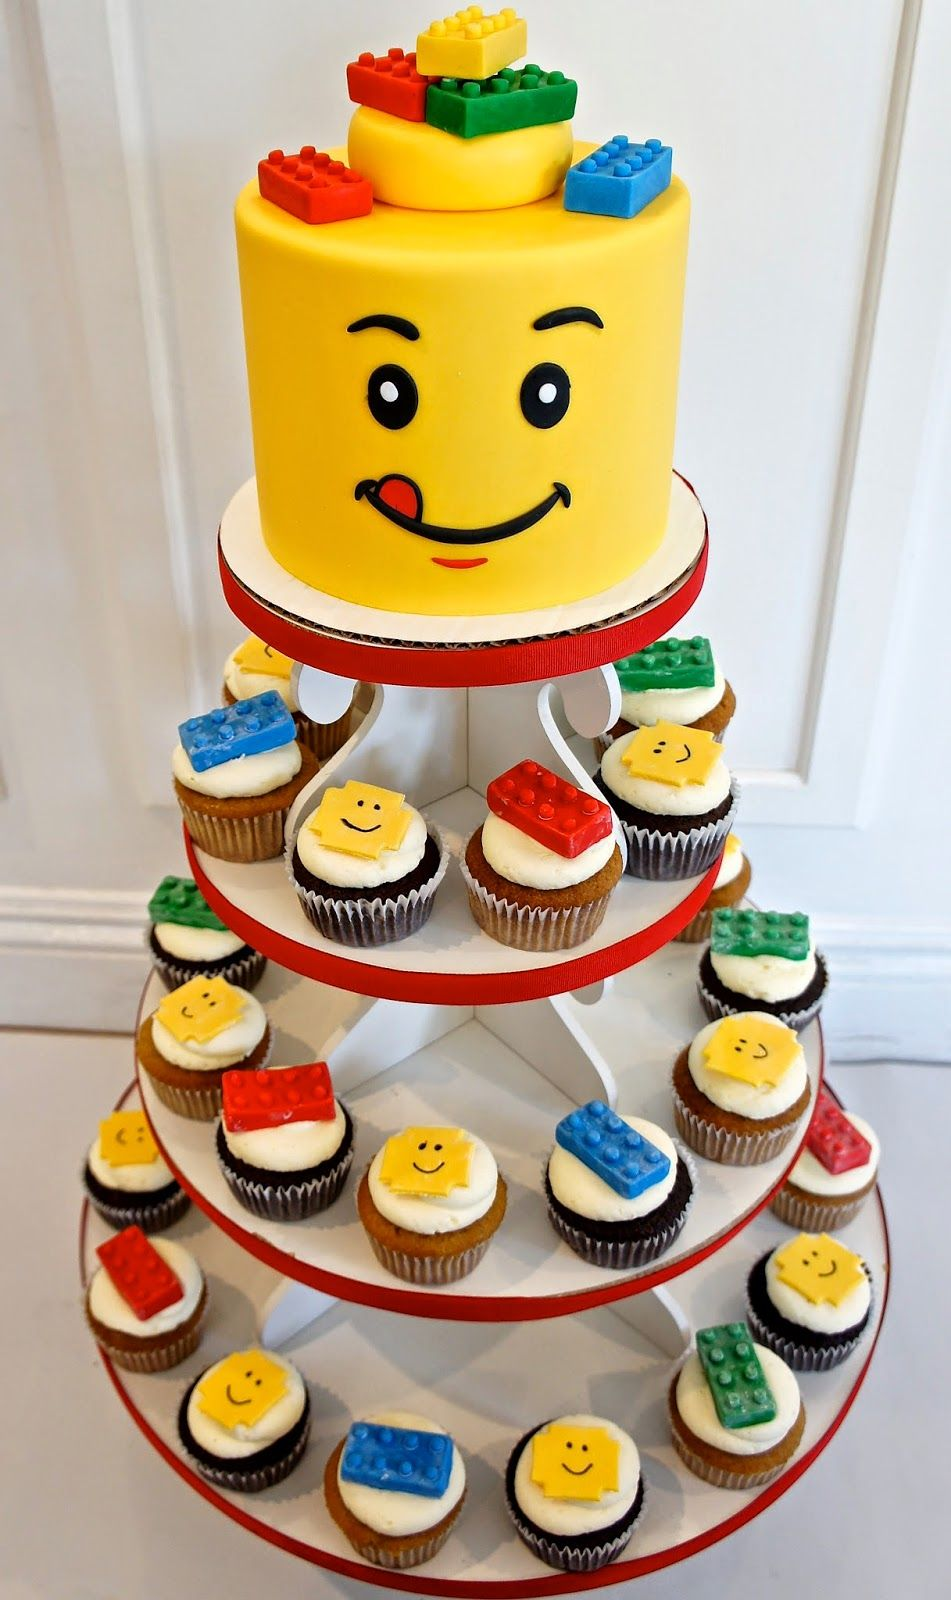 Pin By Tonika Mitchell On Birthday Cakes Lego Torte Lego Kuchen